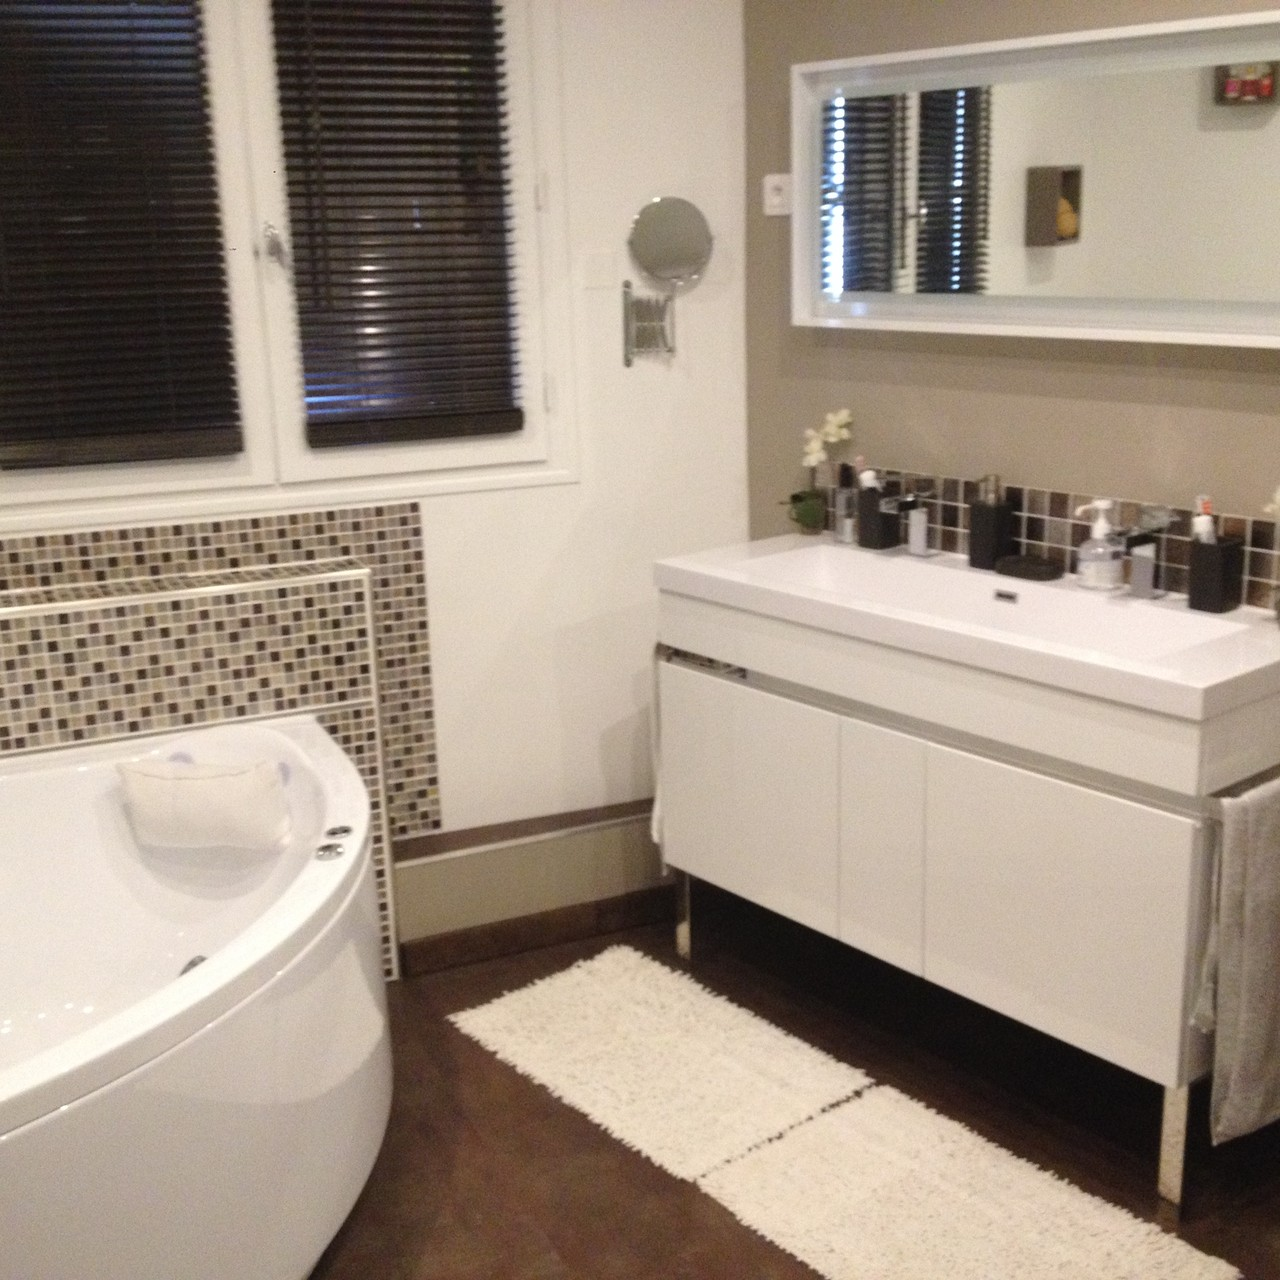 Réaménagement salle de bain